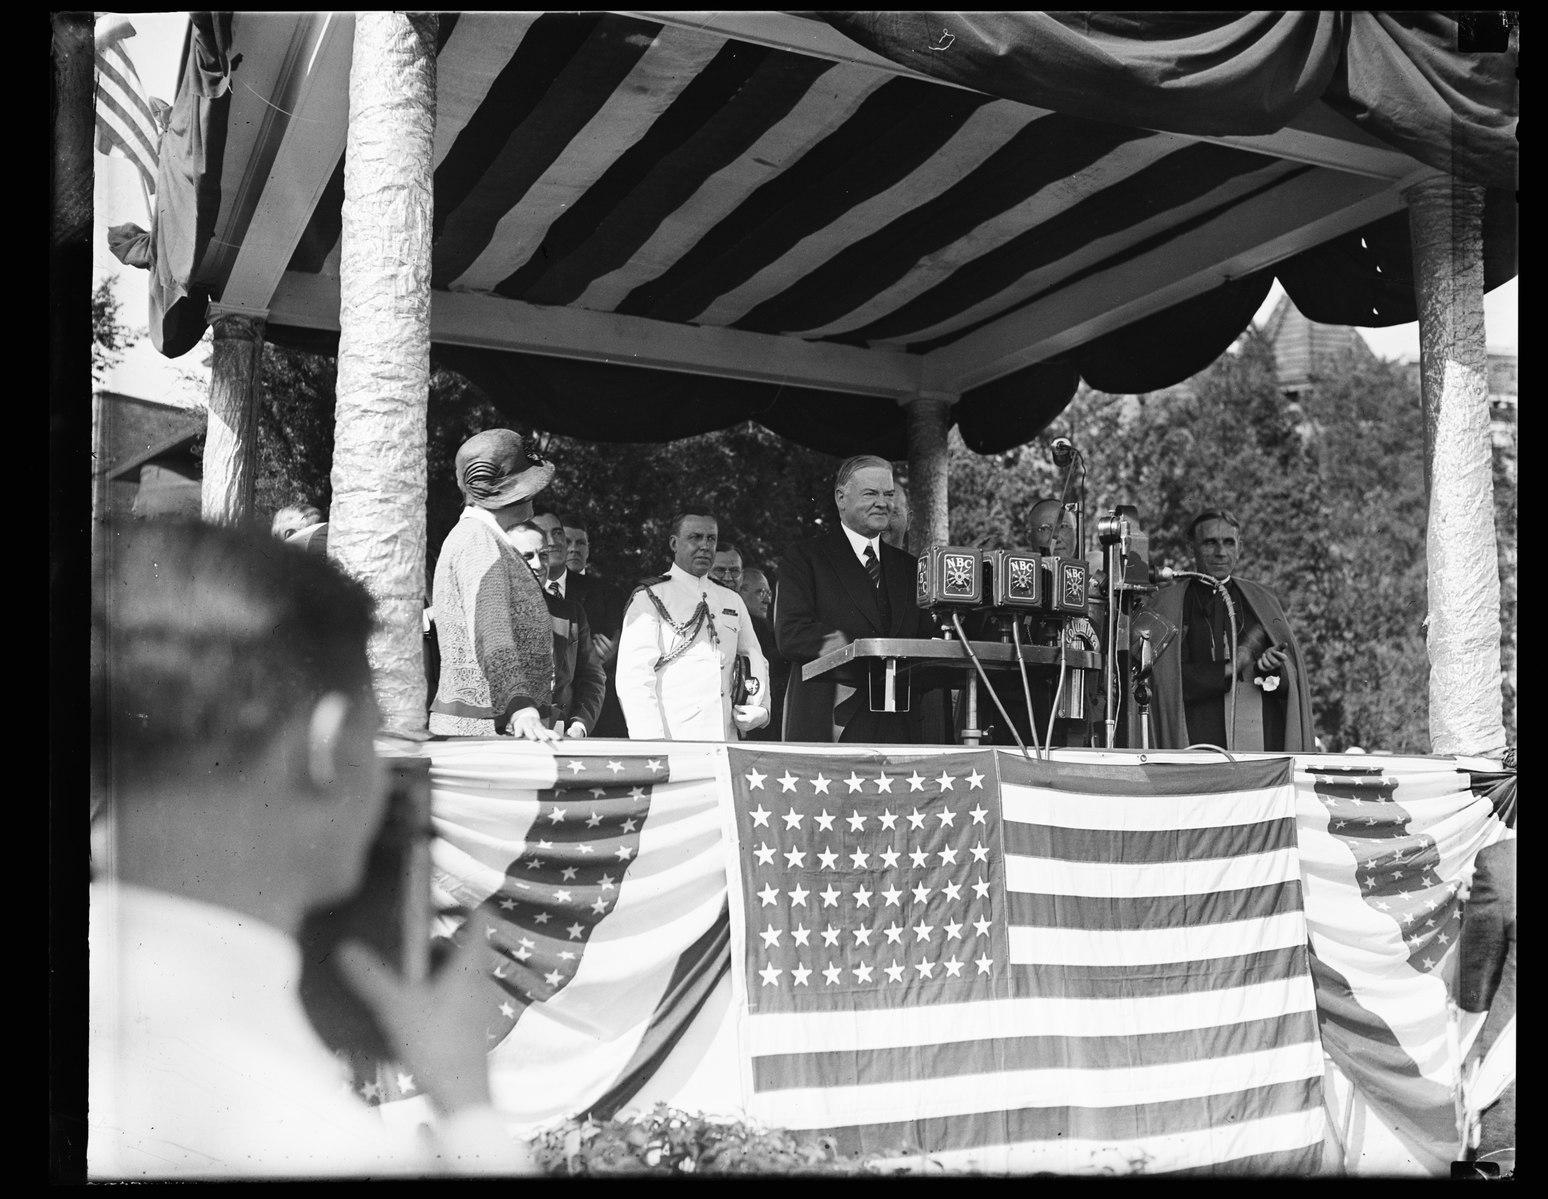 man speaking on gazebo with American flags